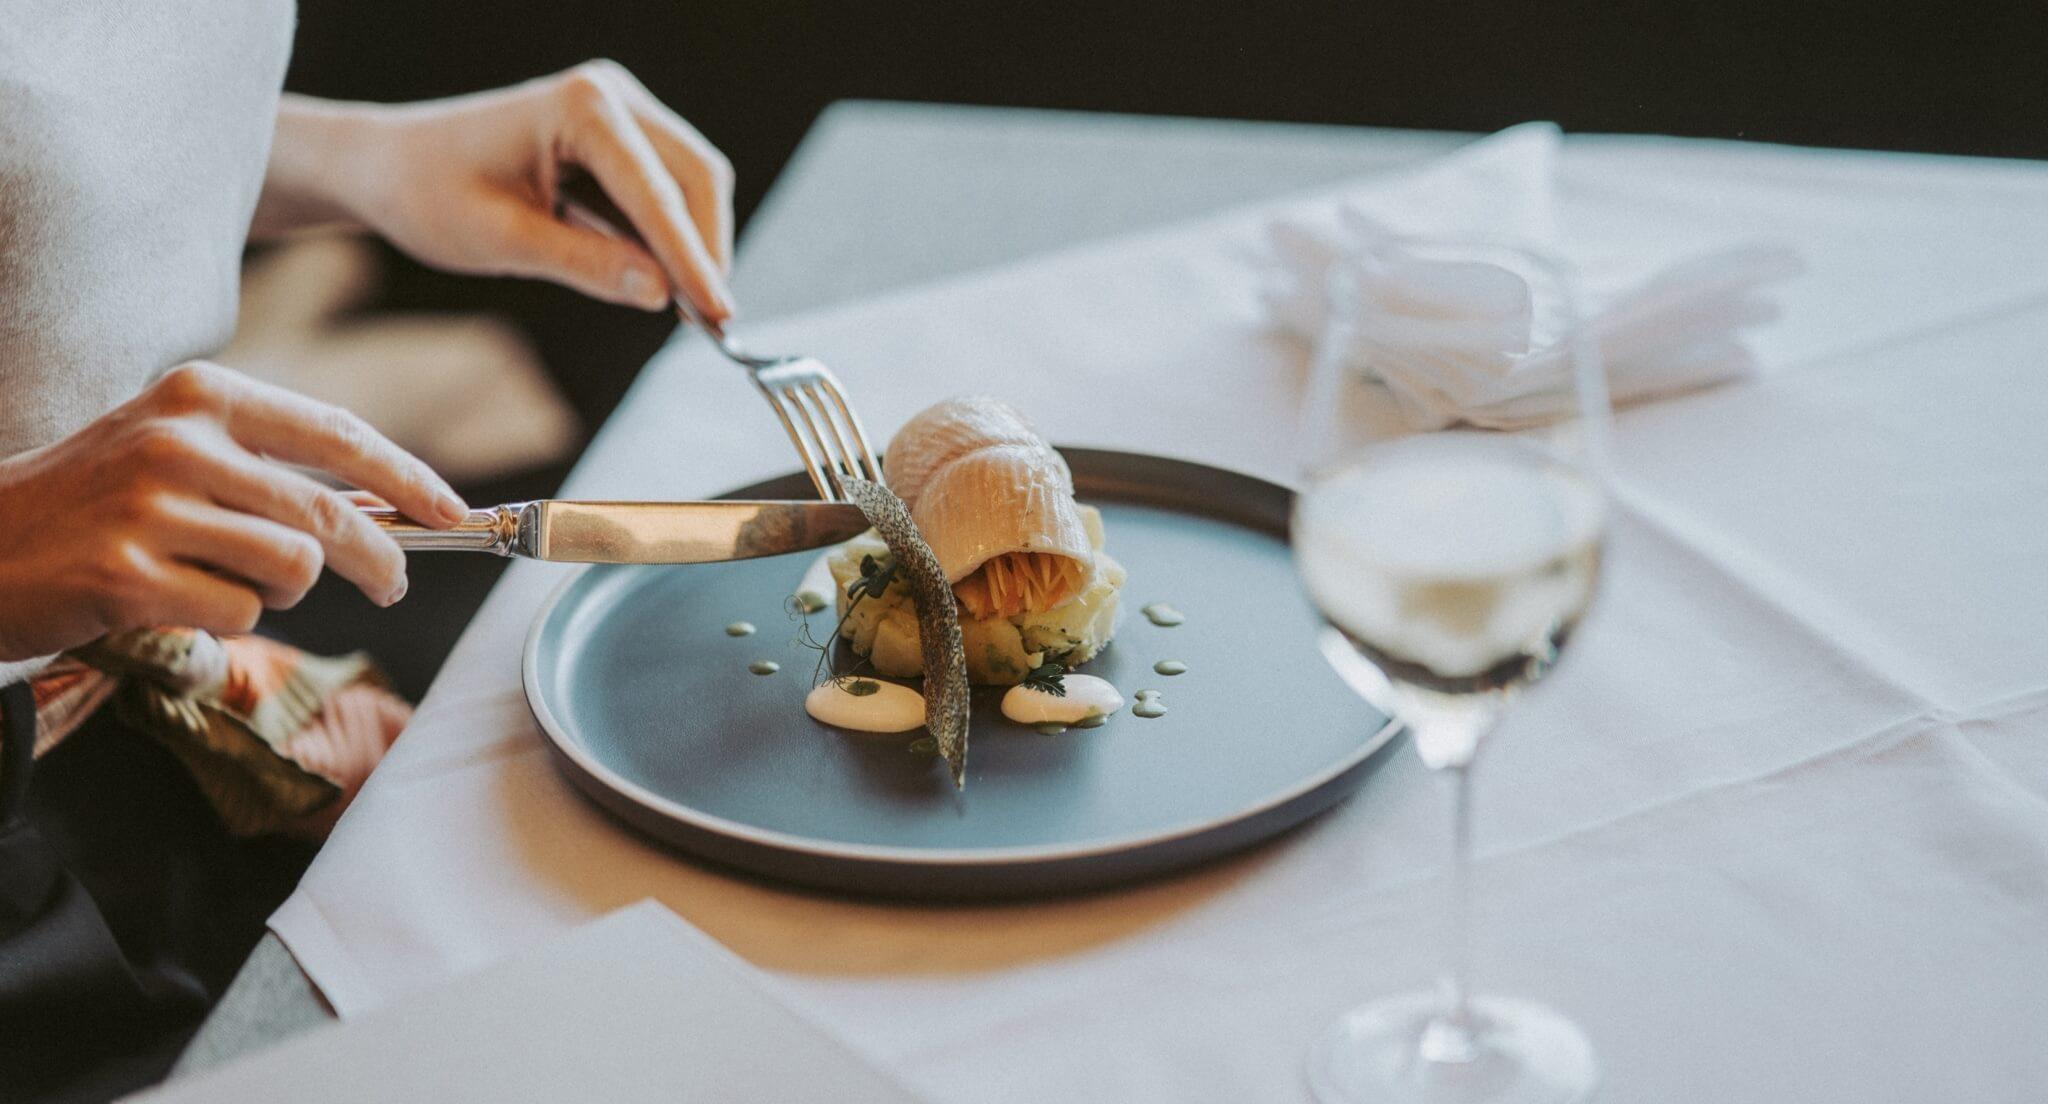 Gutes Essen in Wenigzell - Hotel Fast Joglland